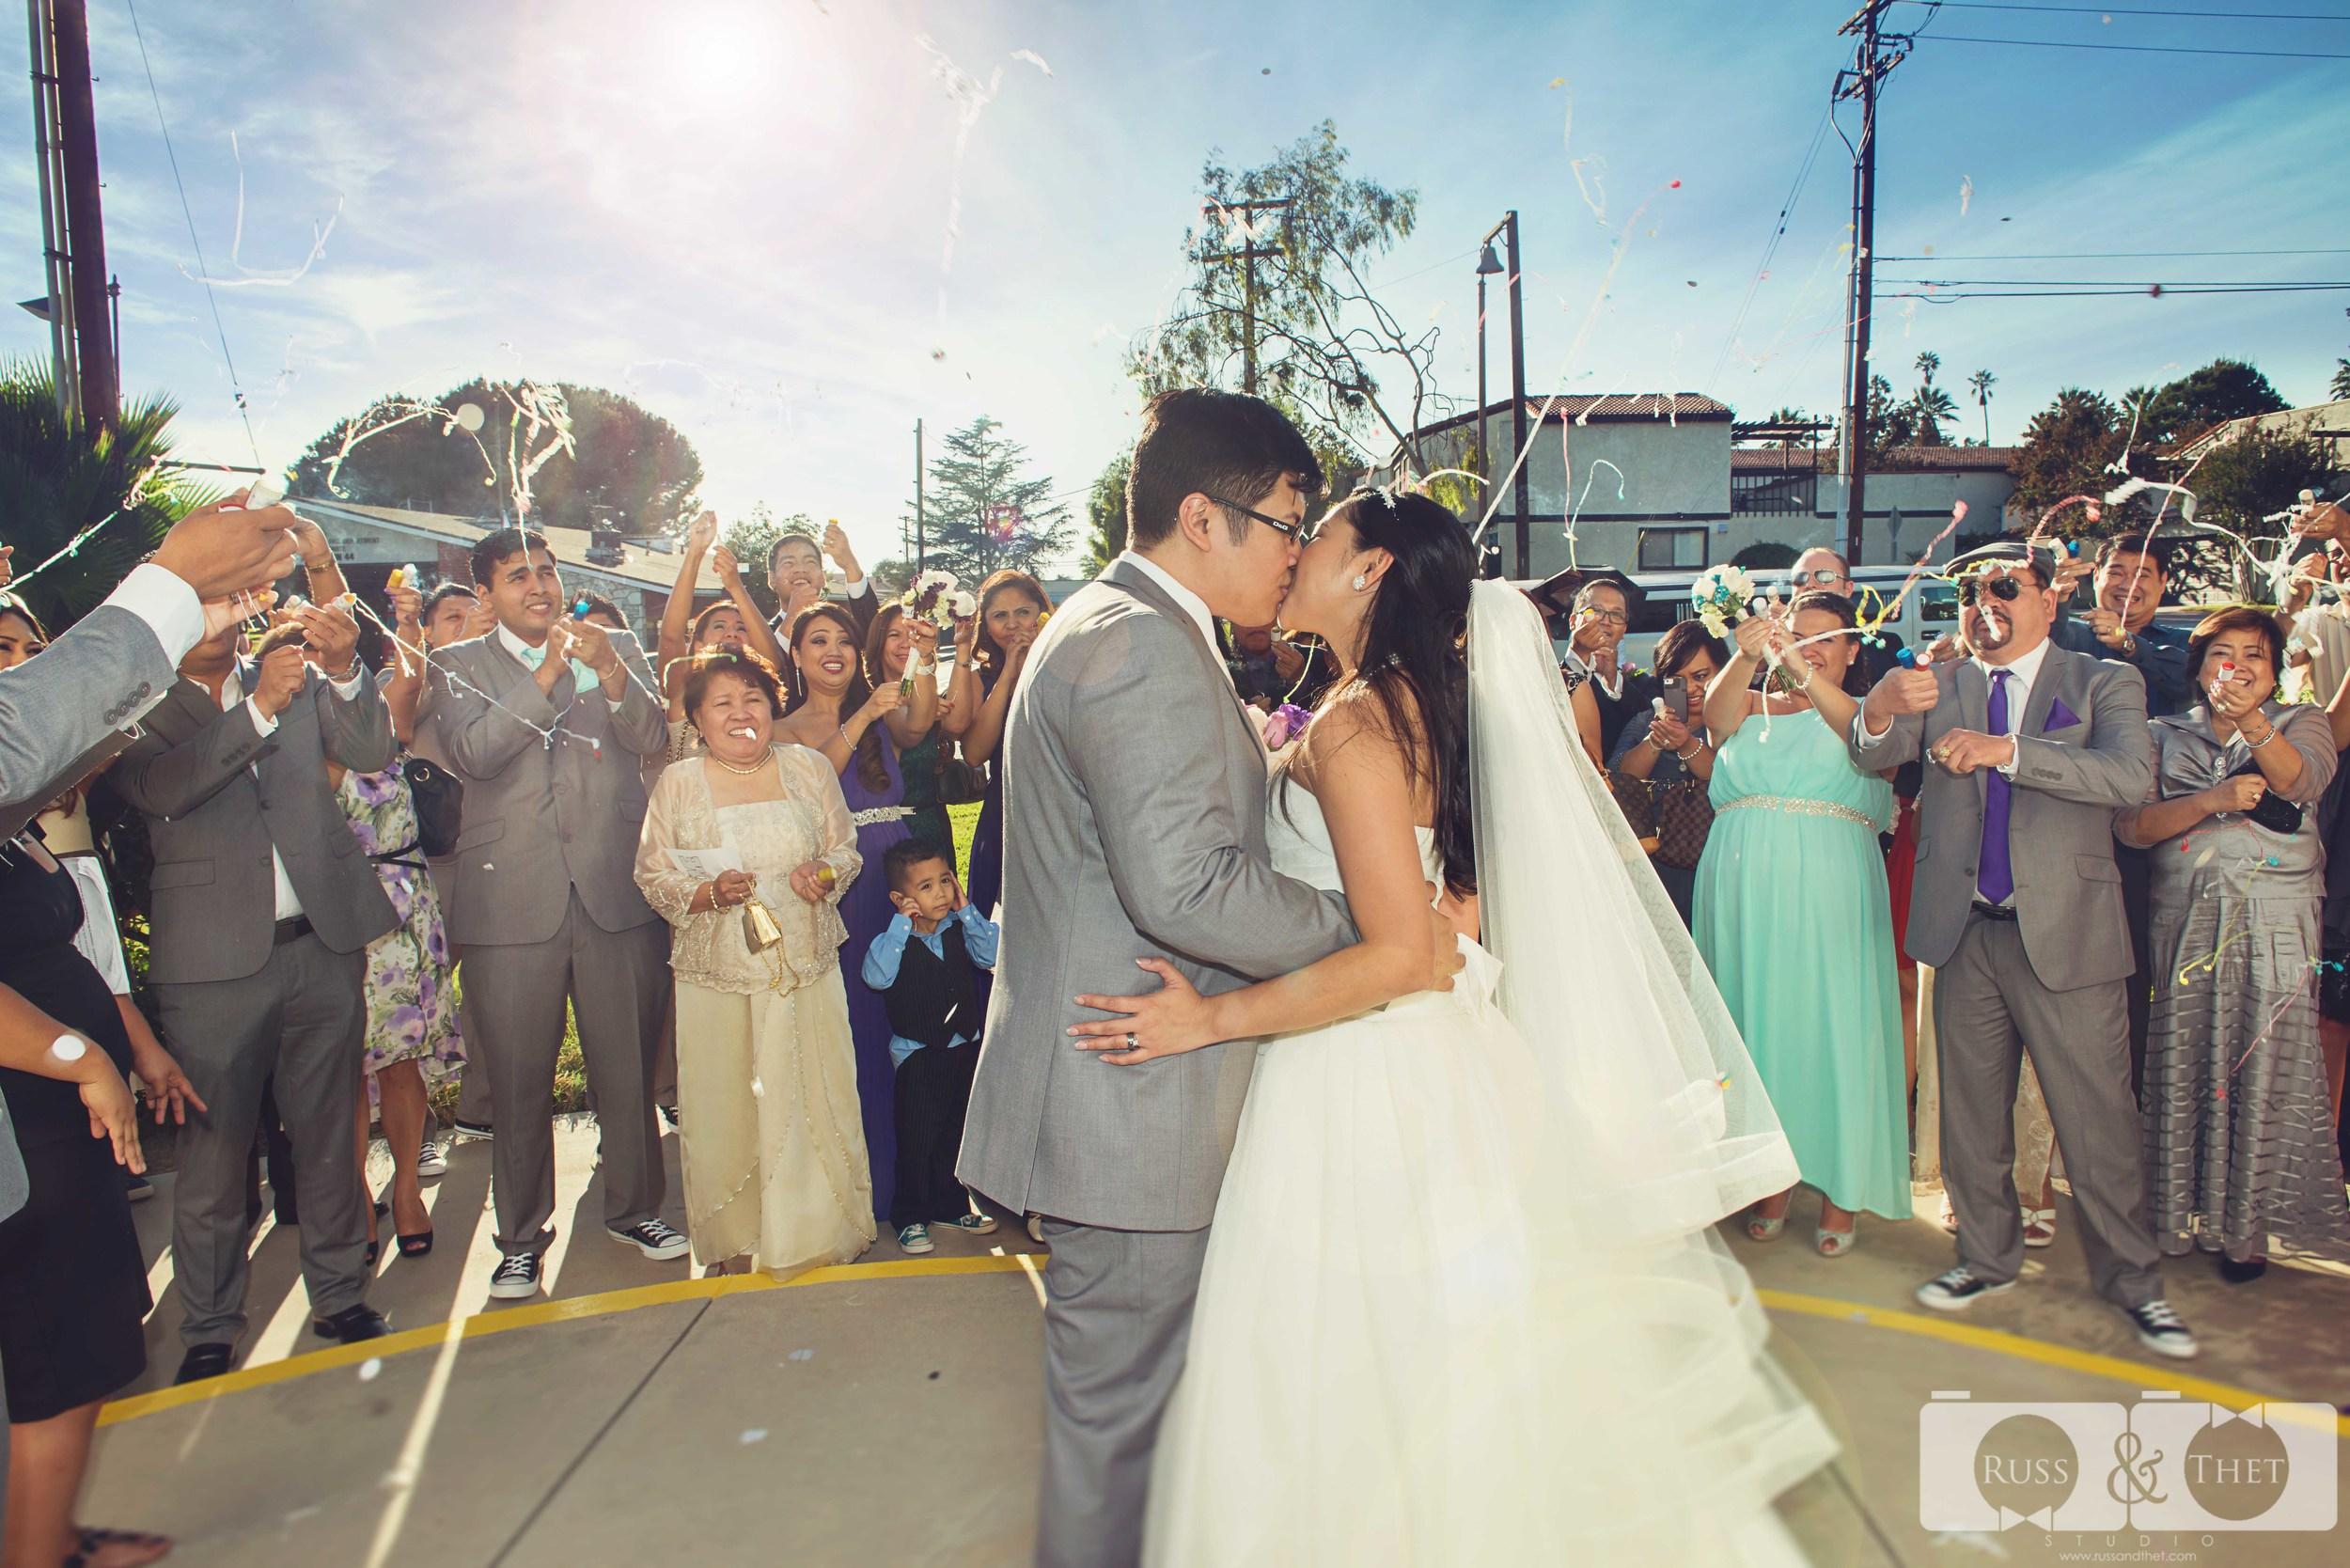 royal-palace-banquet-hall-glendale-wedding-42.JPG